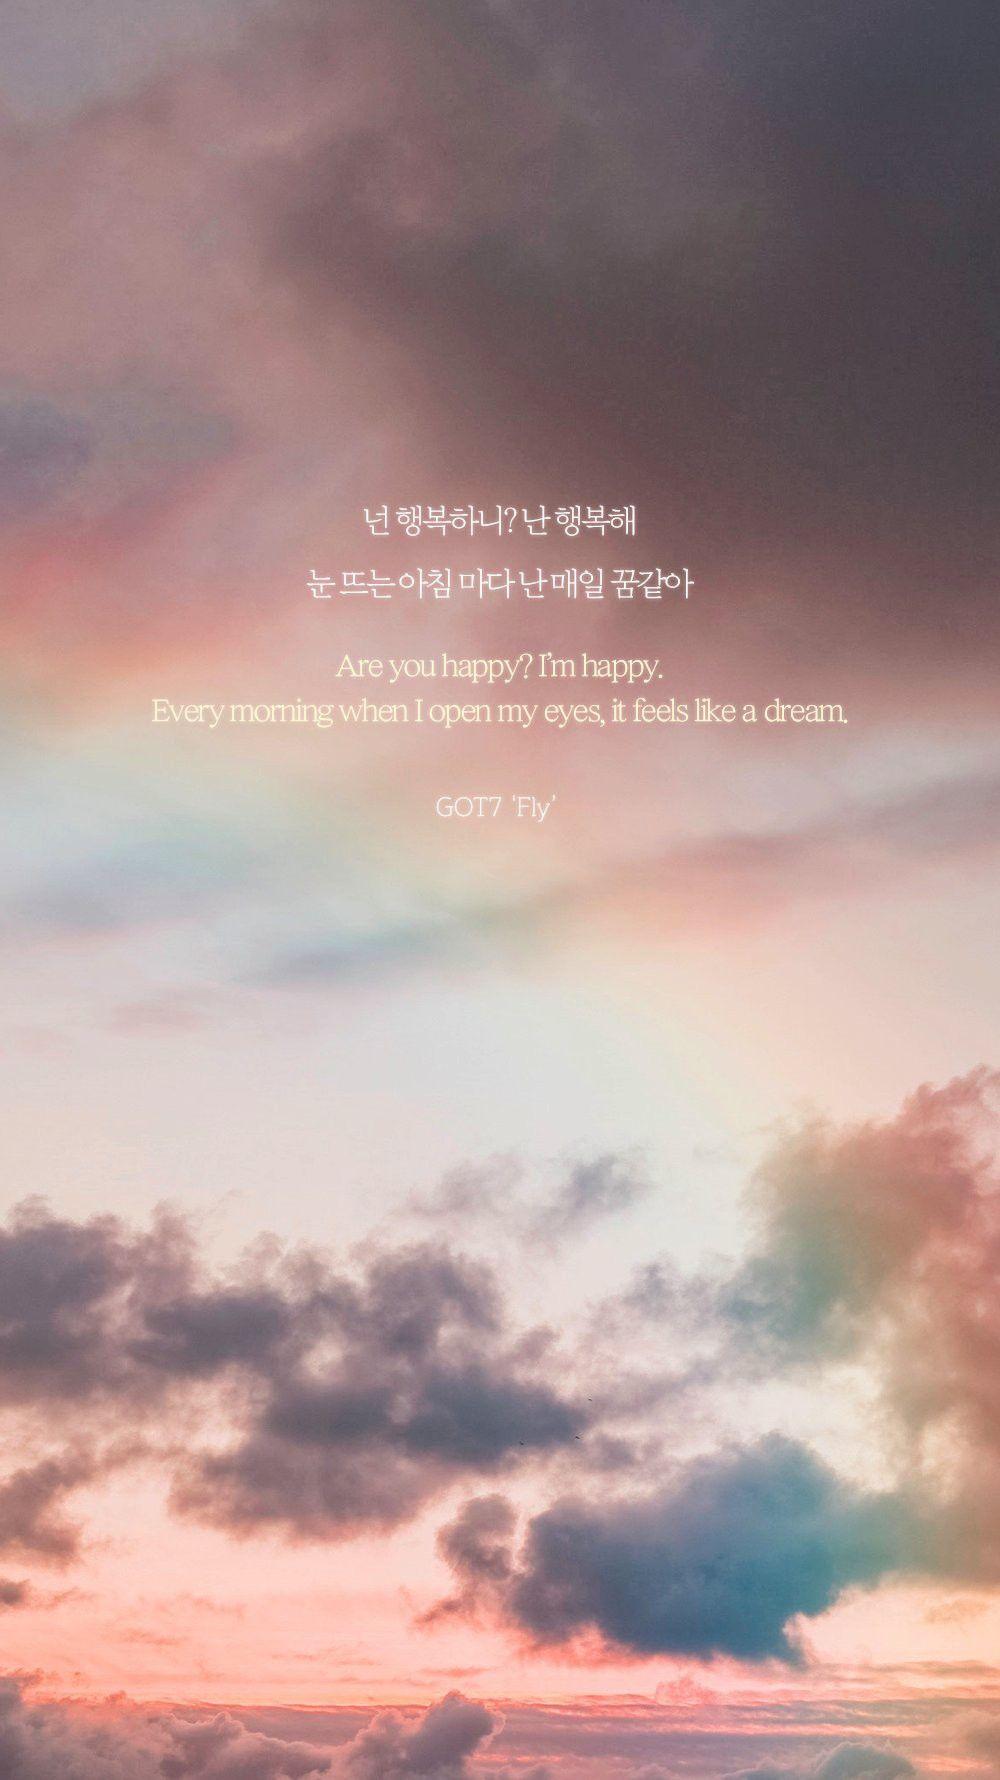 got lyrics korean song lyrics pop lyrics